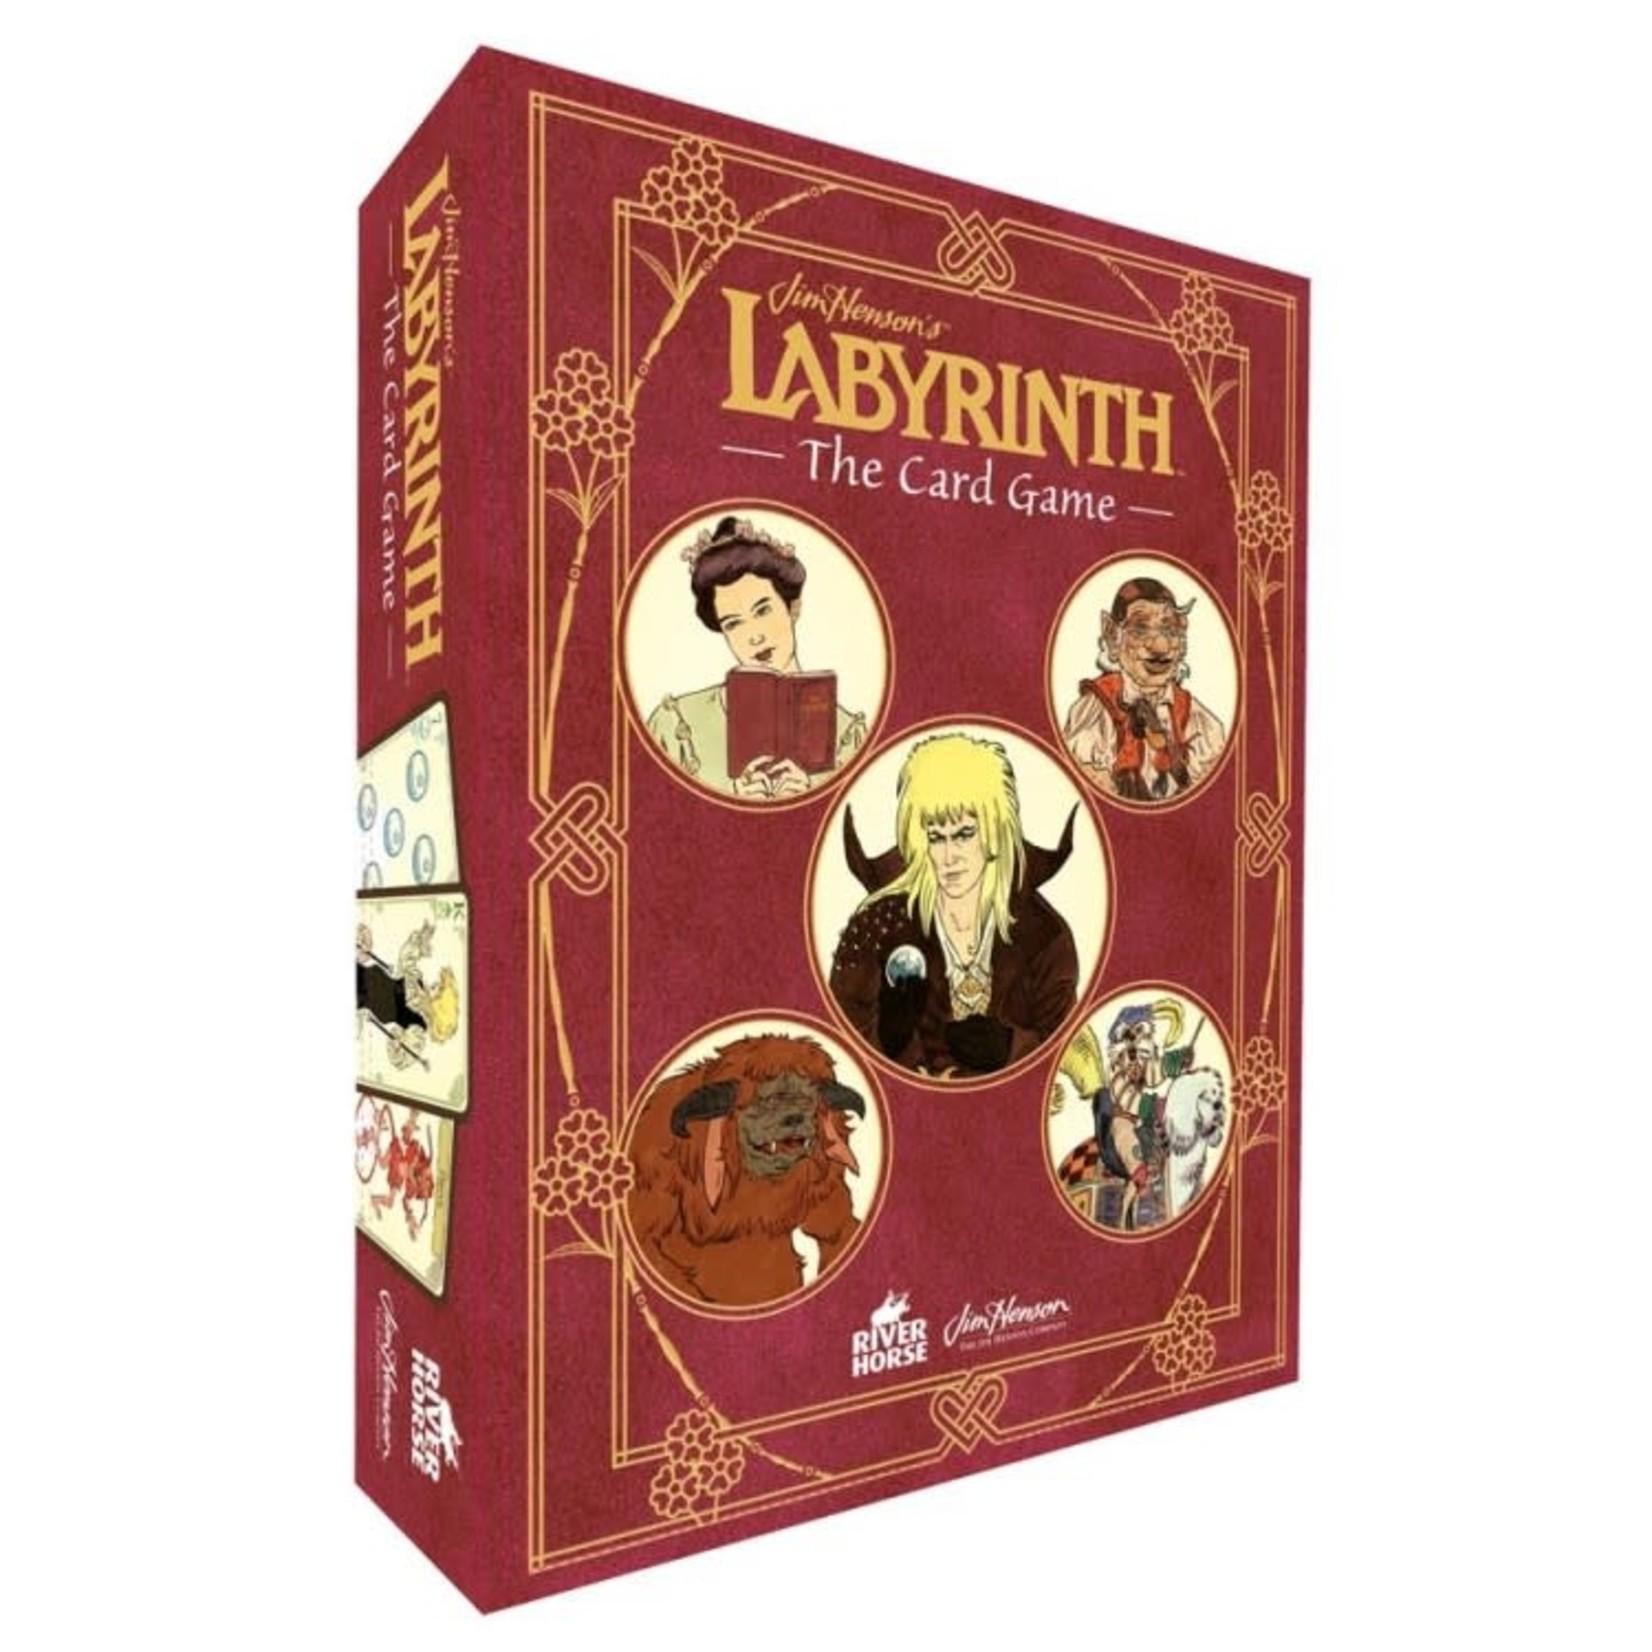 ALC Studios Jim Henson's Labyrinth: The Card Game